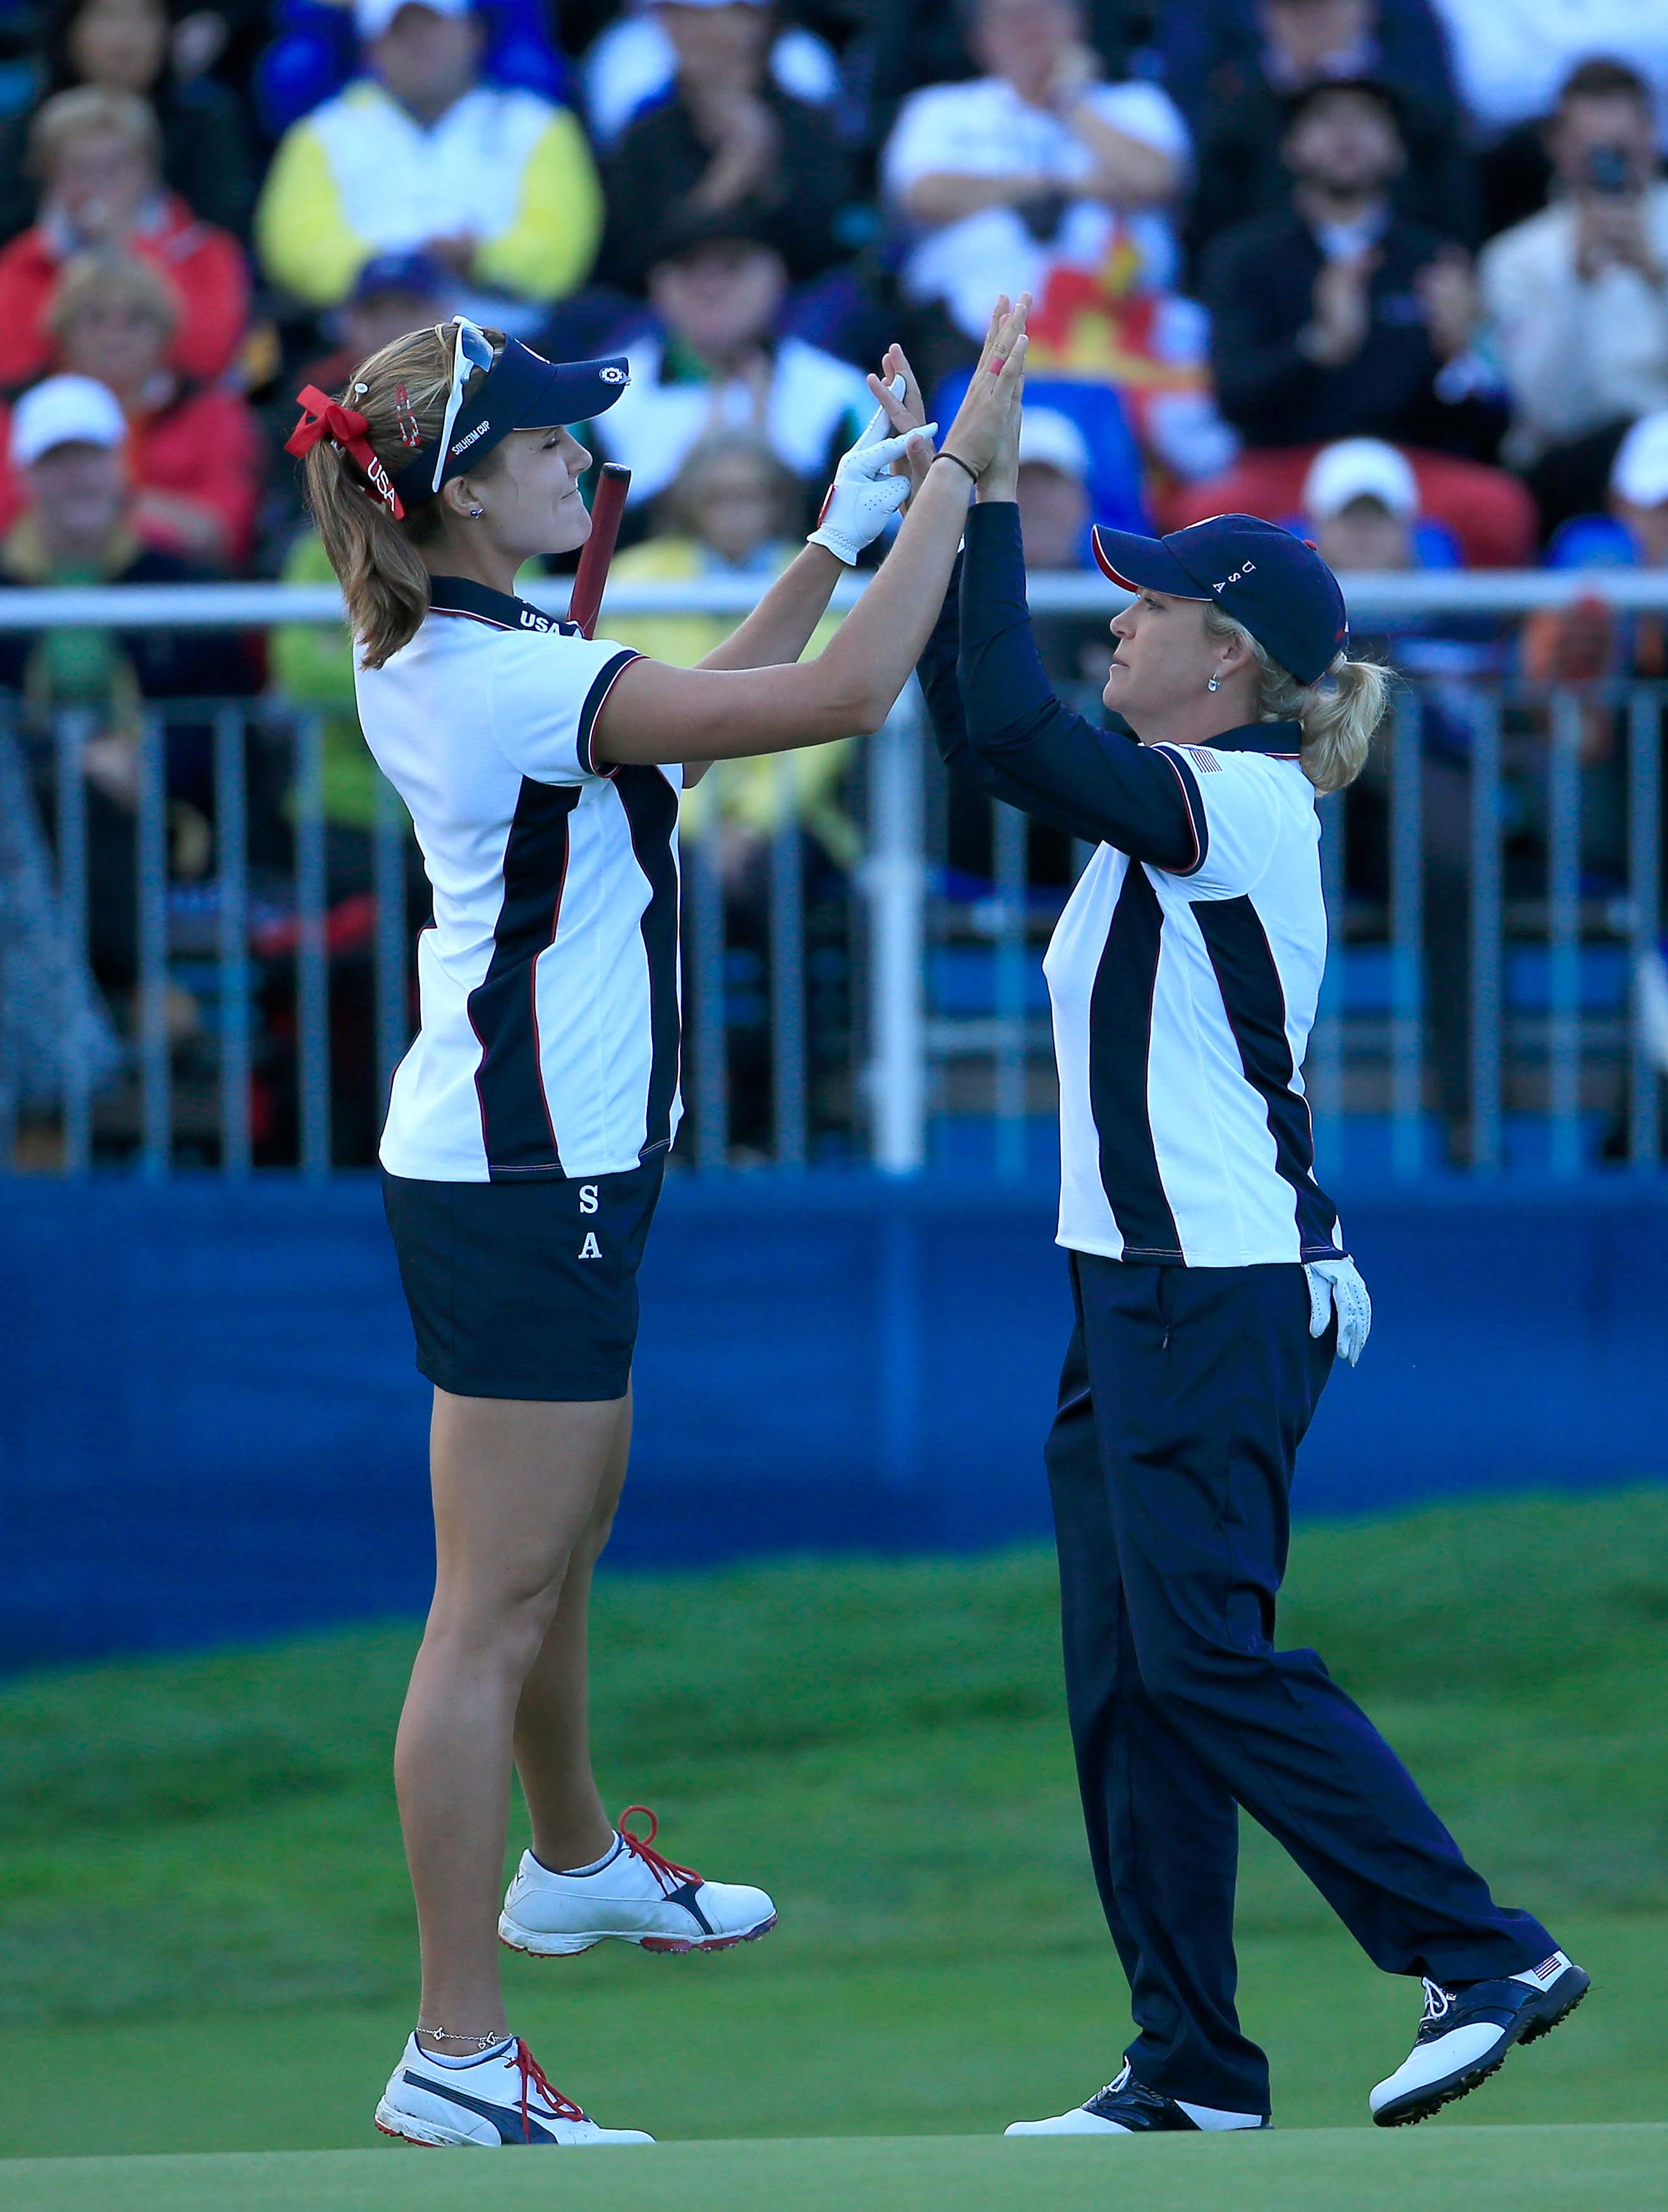 Cristie Kerr and Lexi Thompson